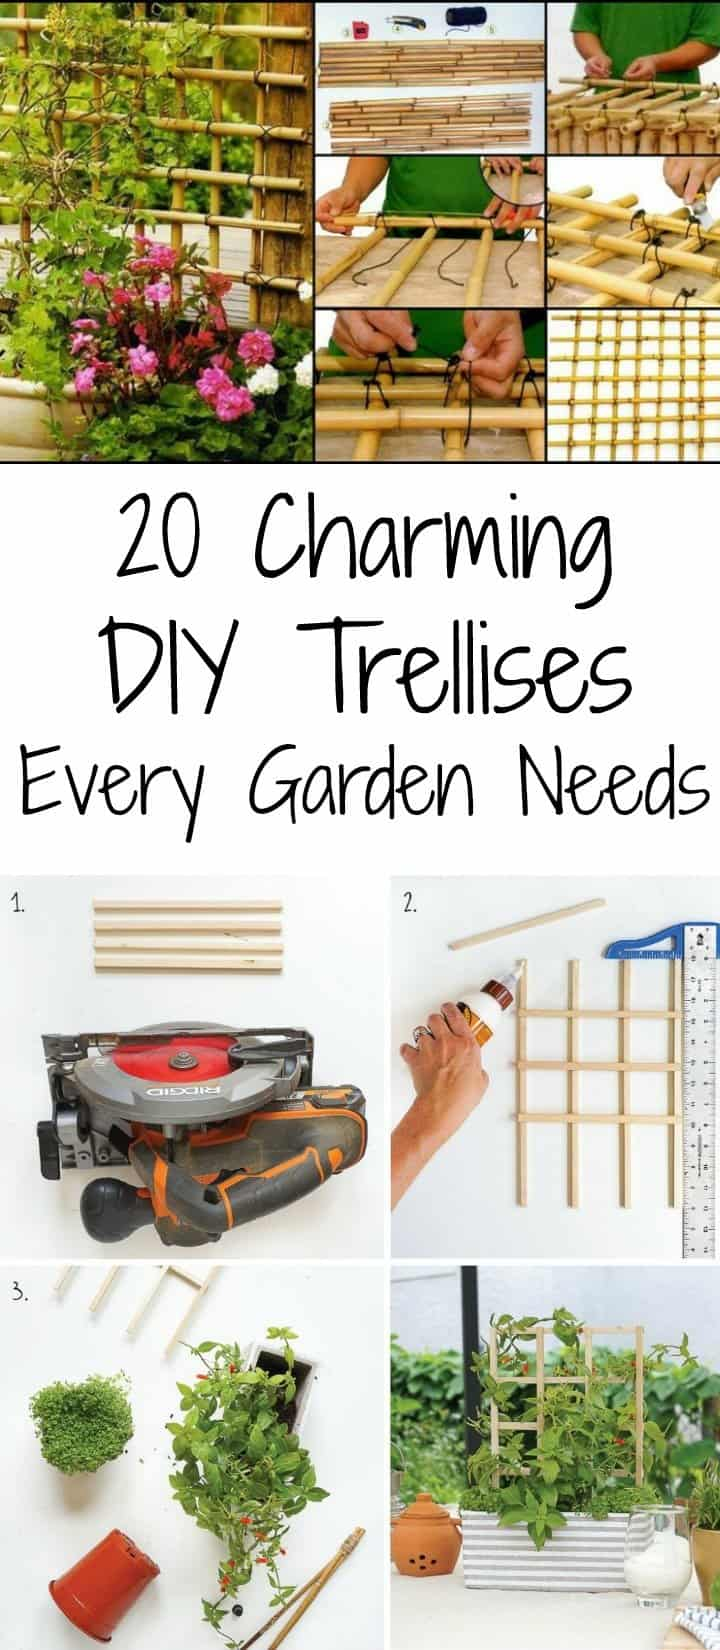 DIY Trellises